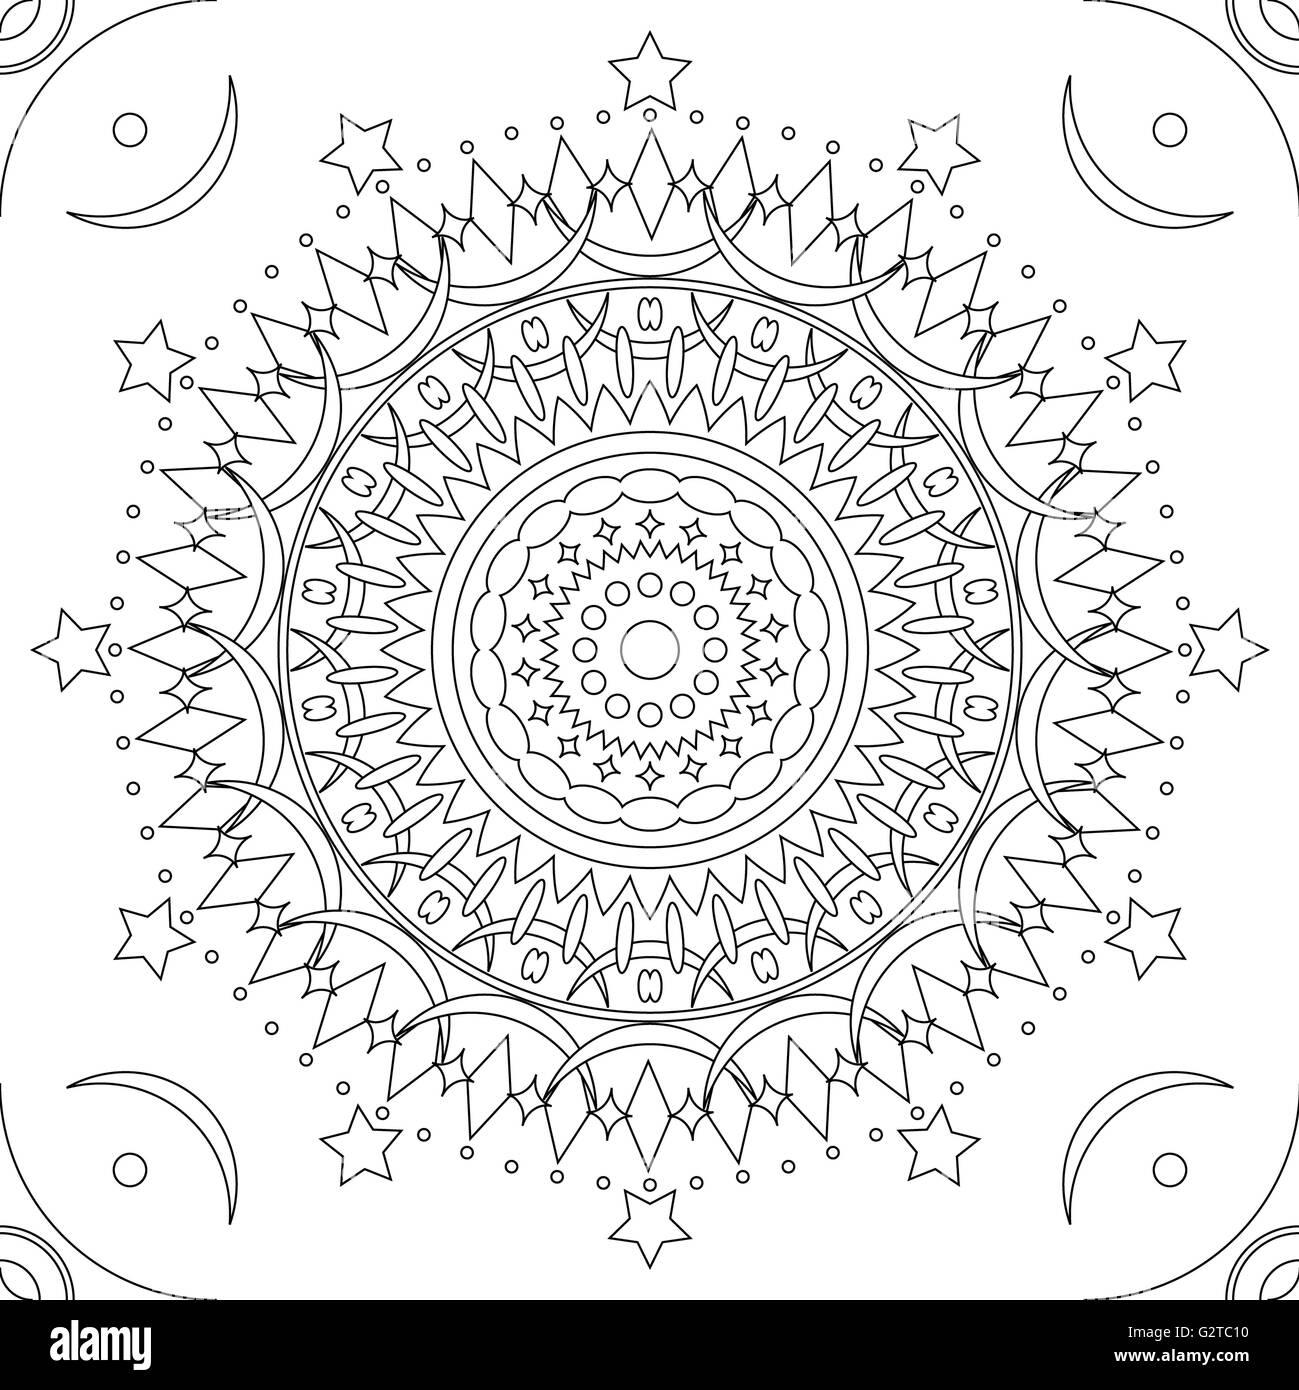 Mandala Pattern Stock Photos & Mandala Pattern Stock Images